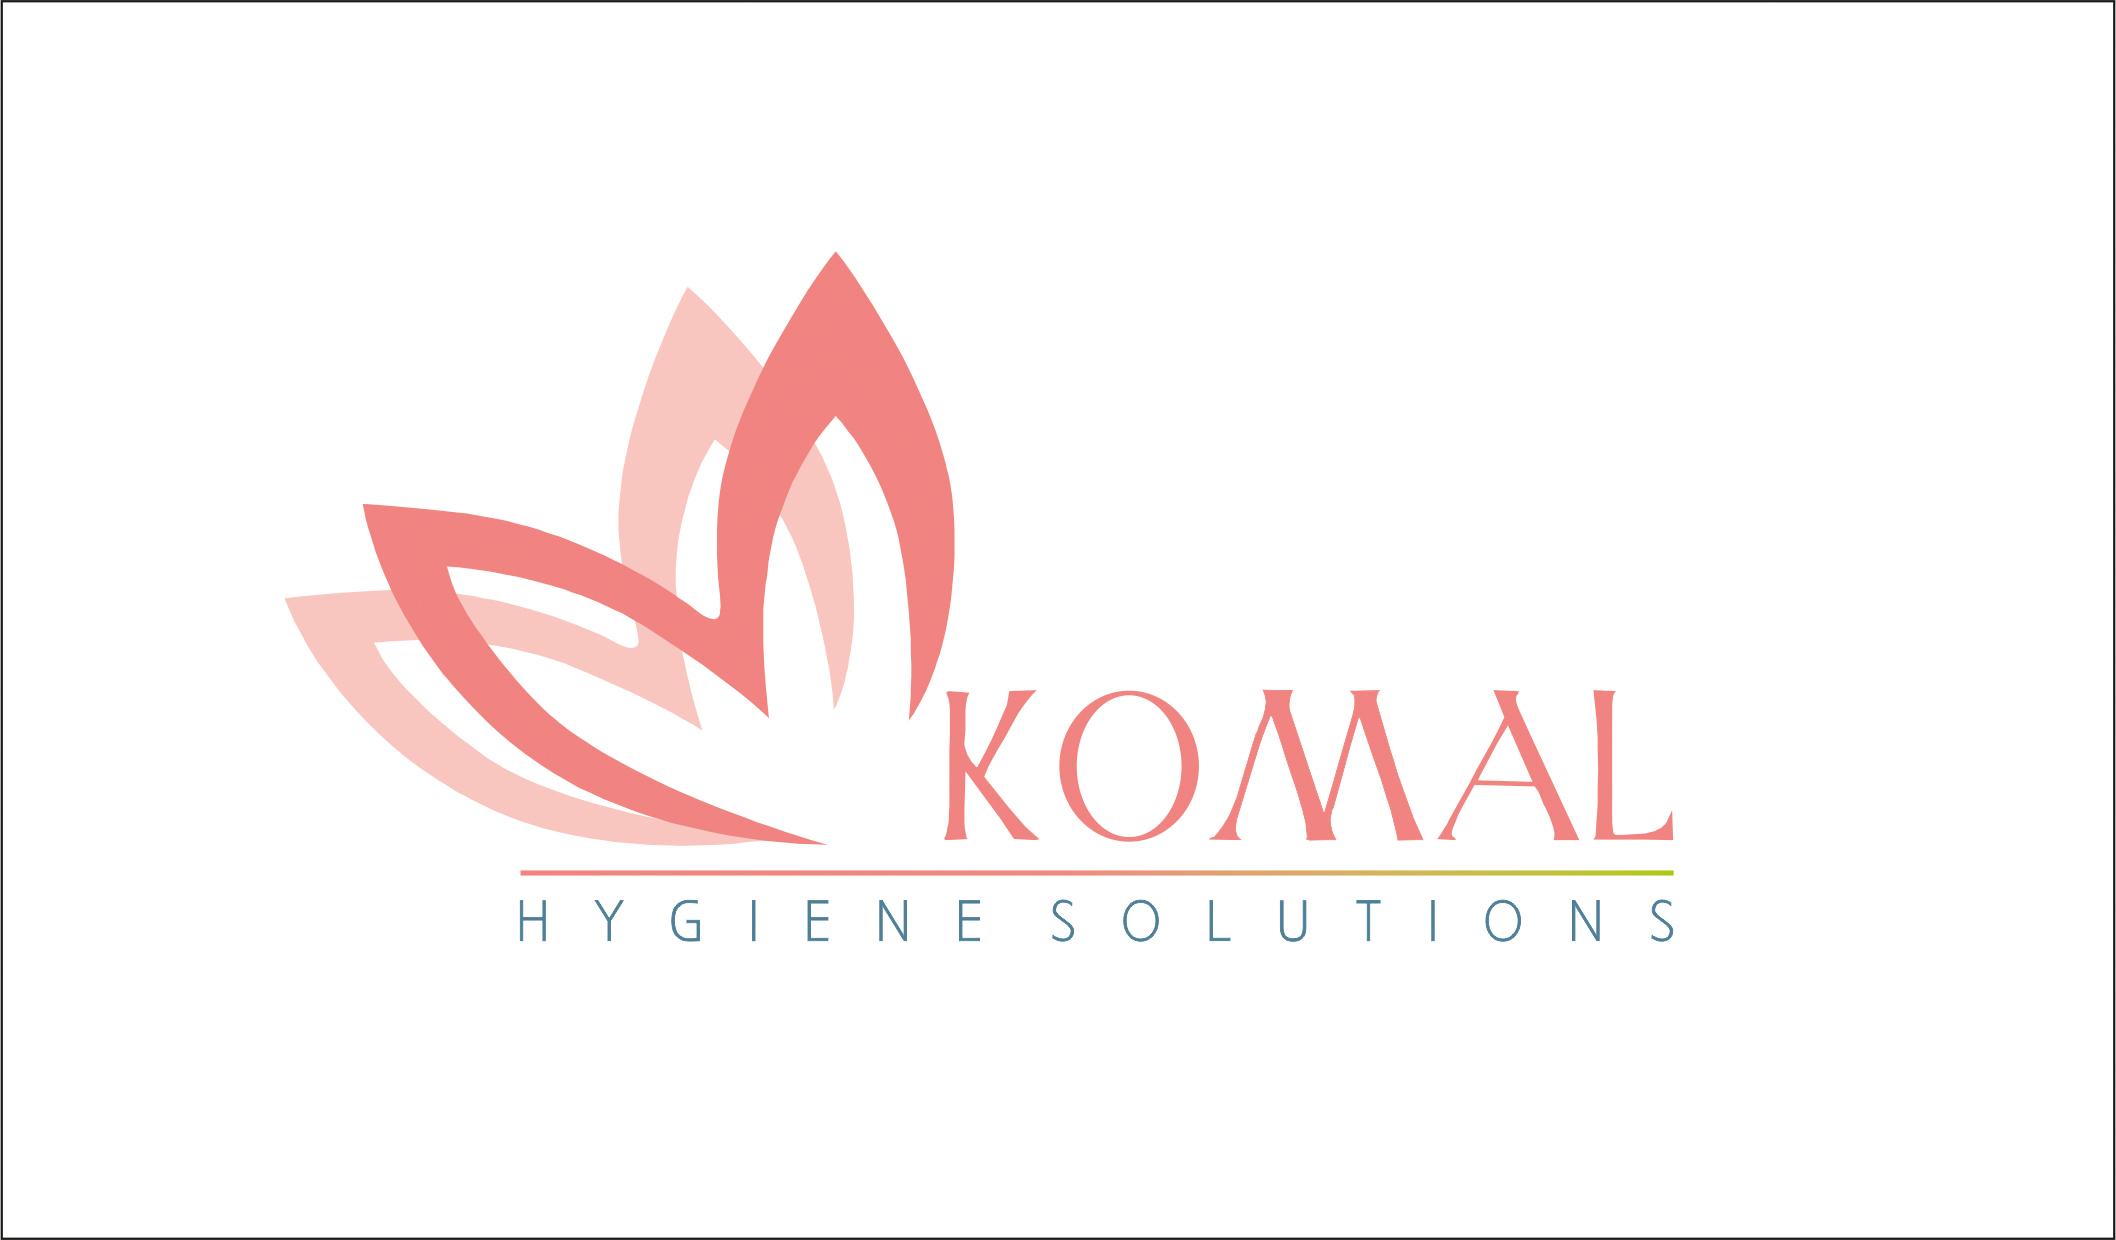 Komal Hygiene Solutions